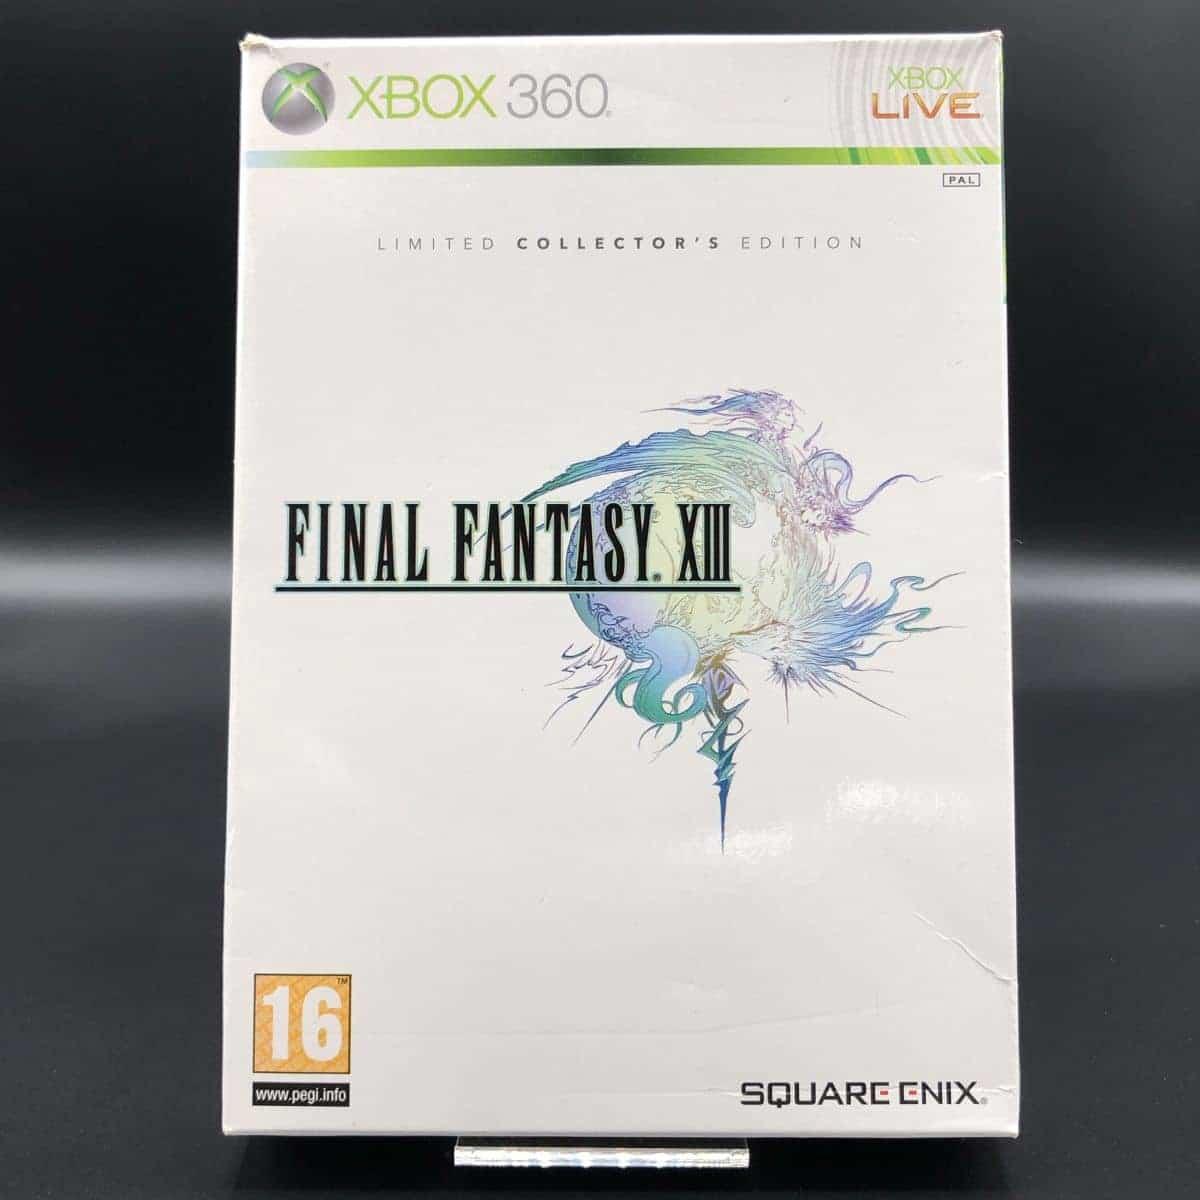 Final Fantasy XIII (Collector's Edition) (Komplett) (Gut) XBOX 360